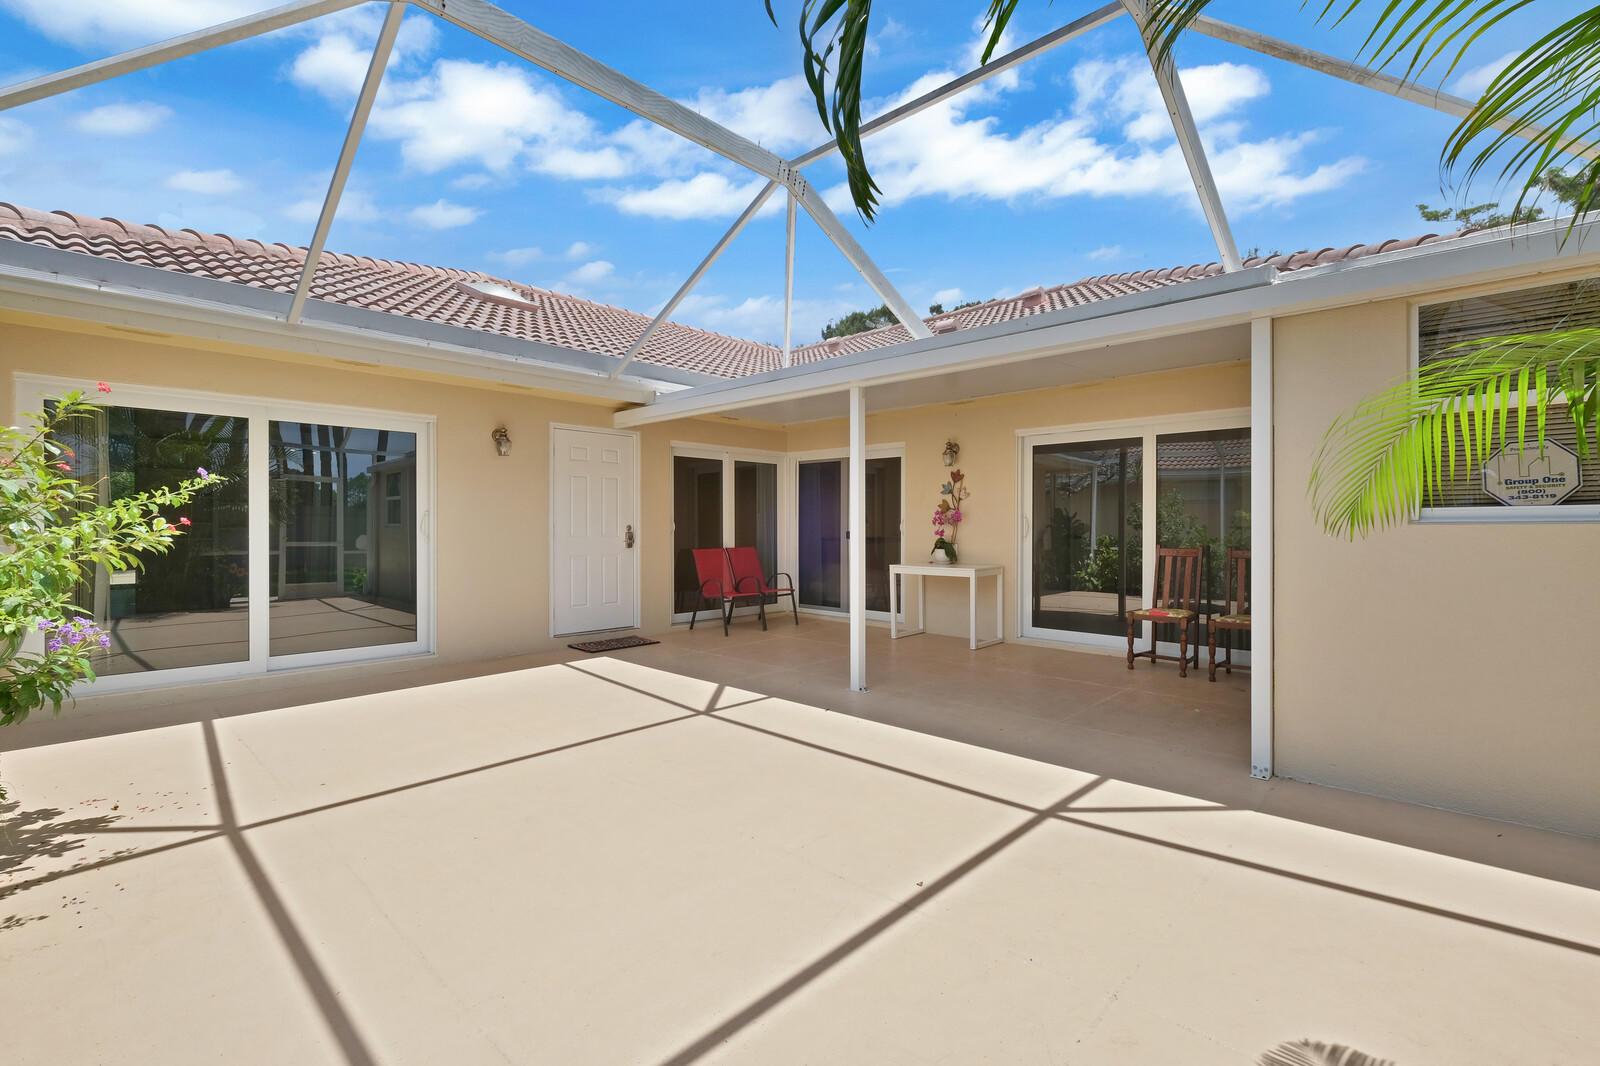 9124  Sun Terrace Circle D For Sale 10727844, FL